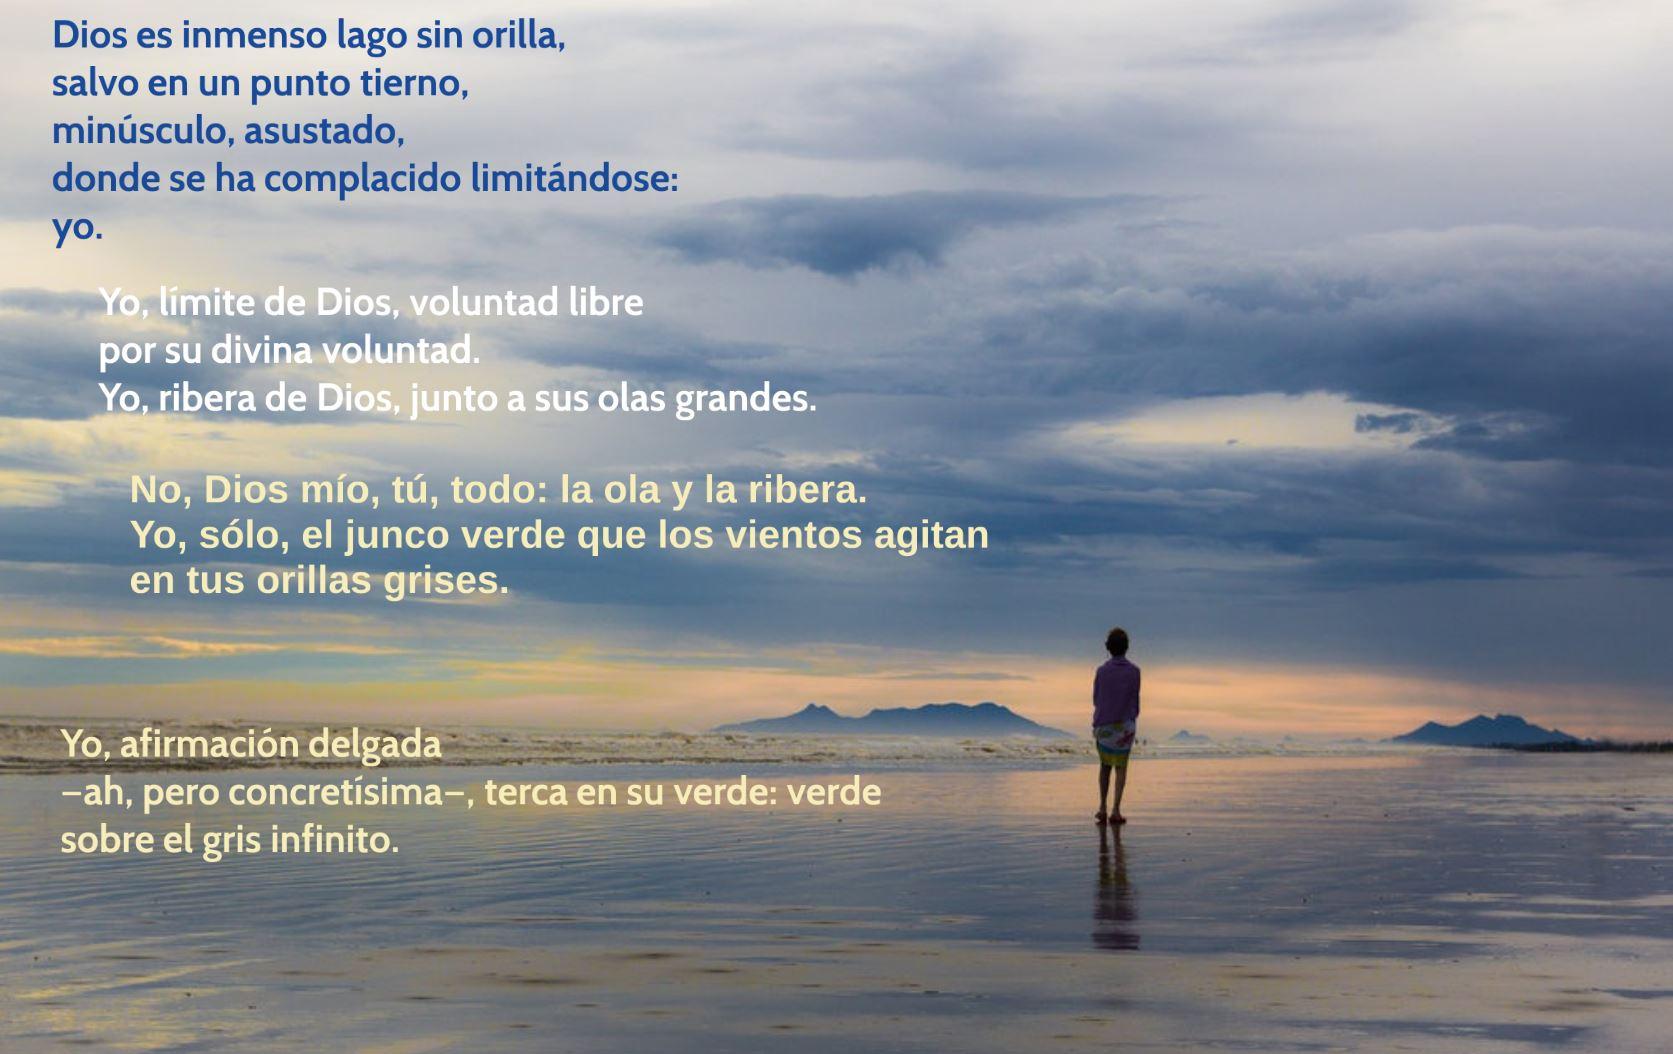 Dios es un inmenso lago (Dámaso Alonso)